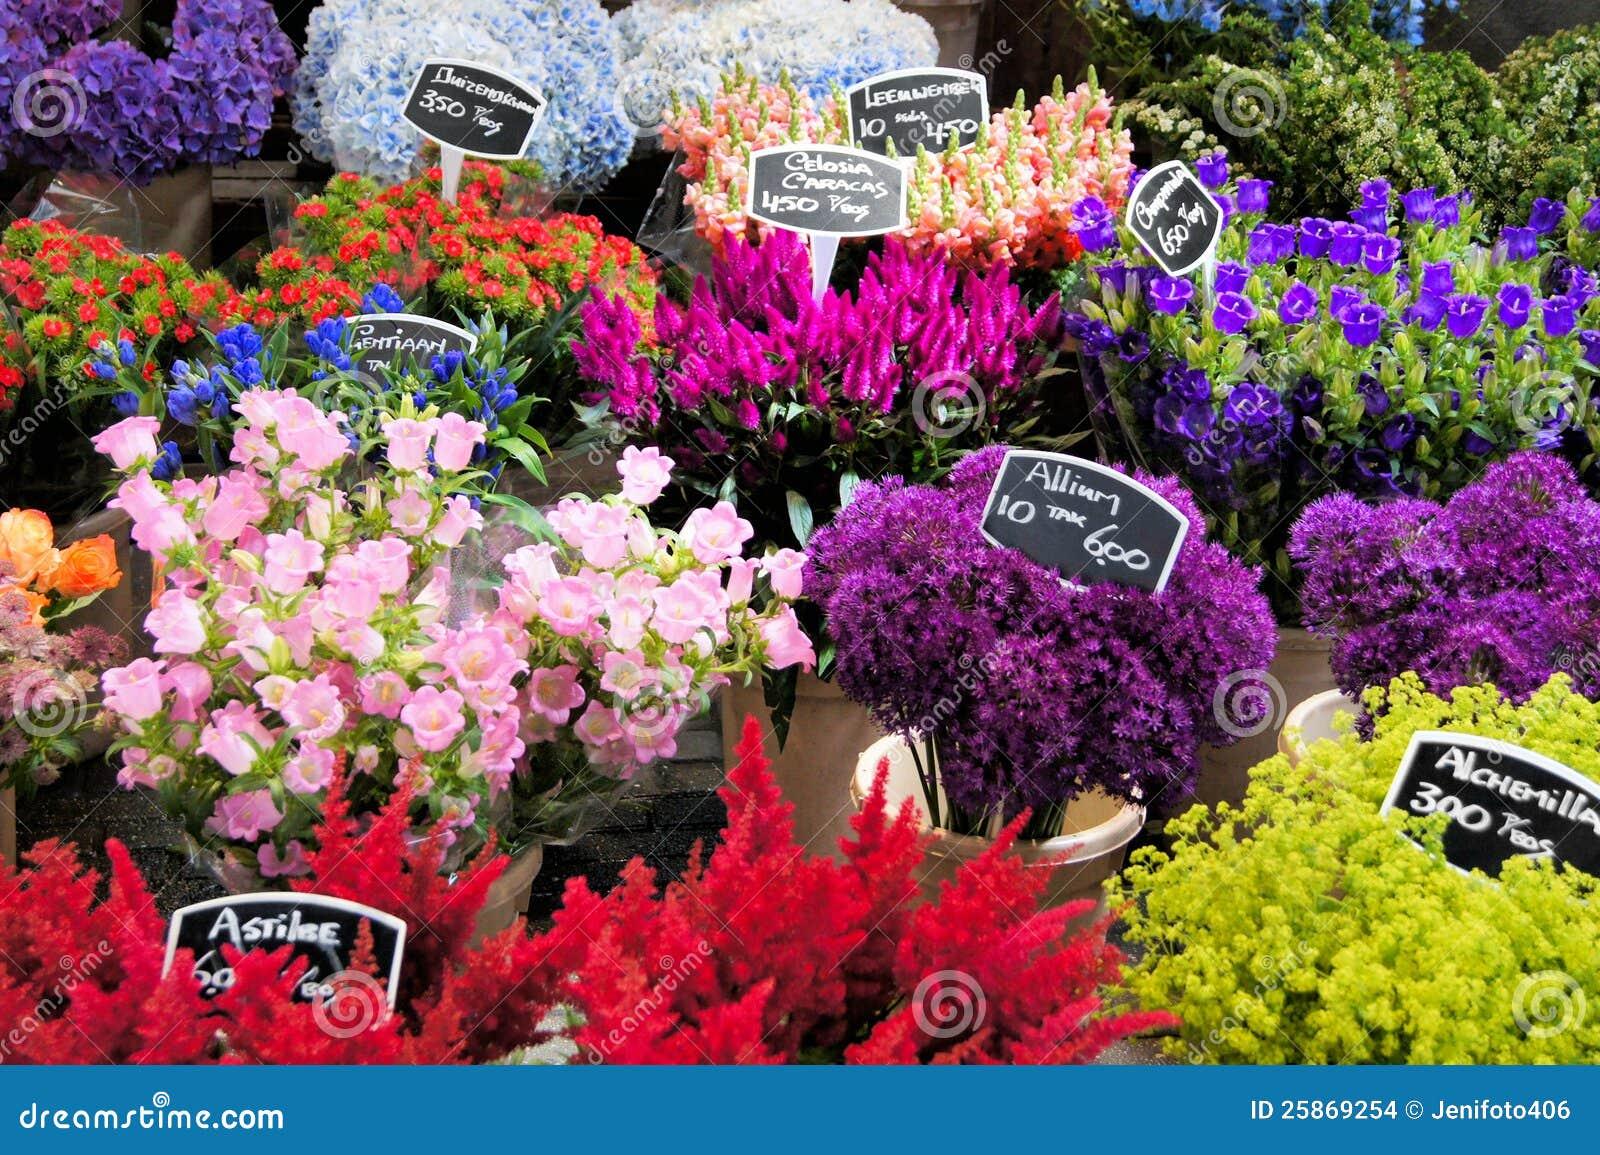 the dutch flower cluster